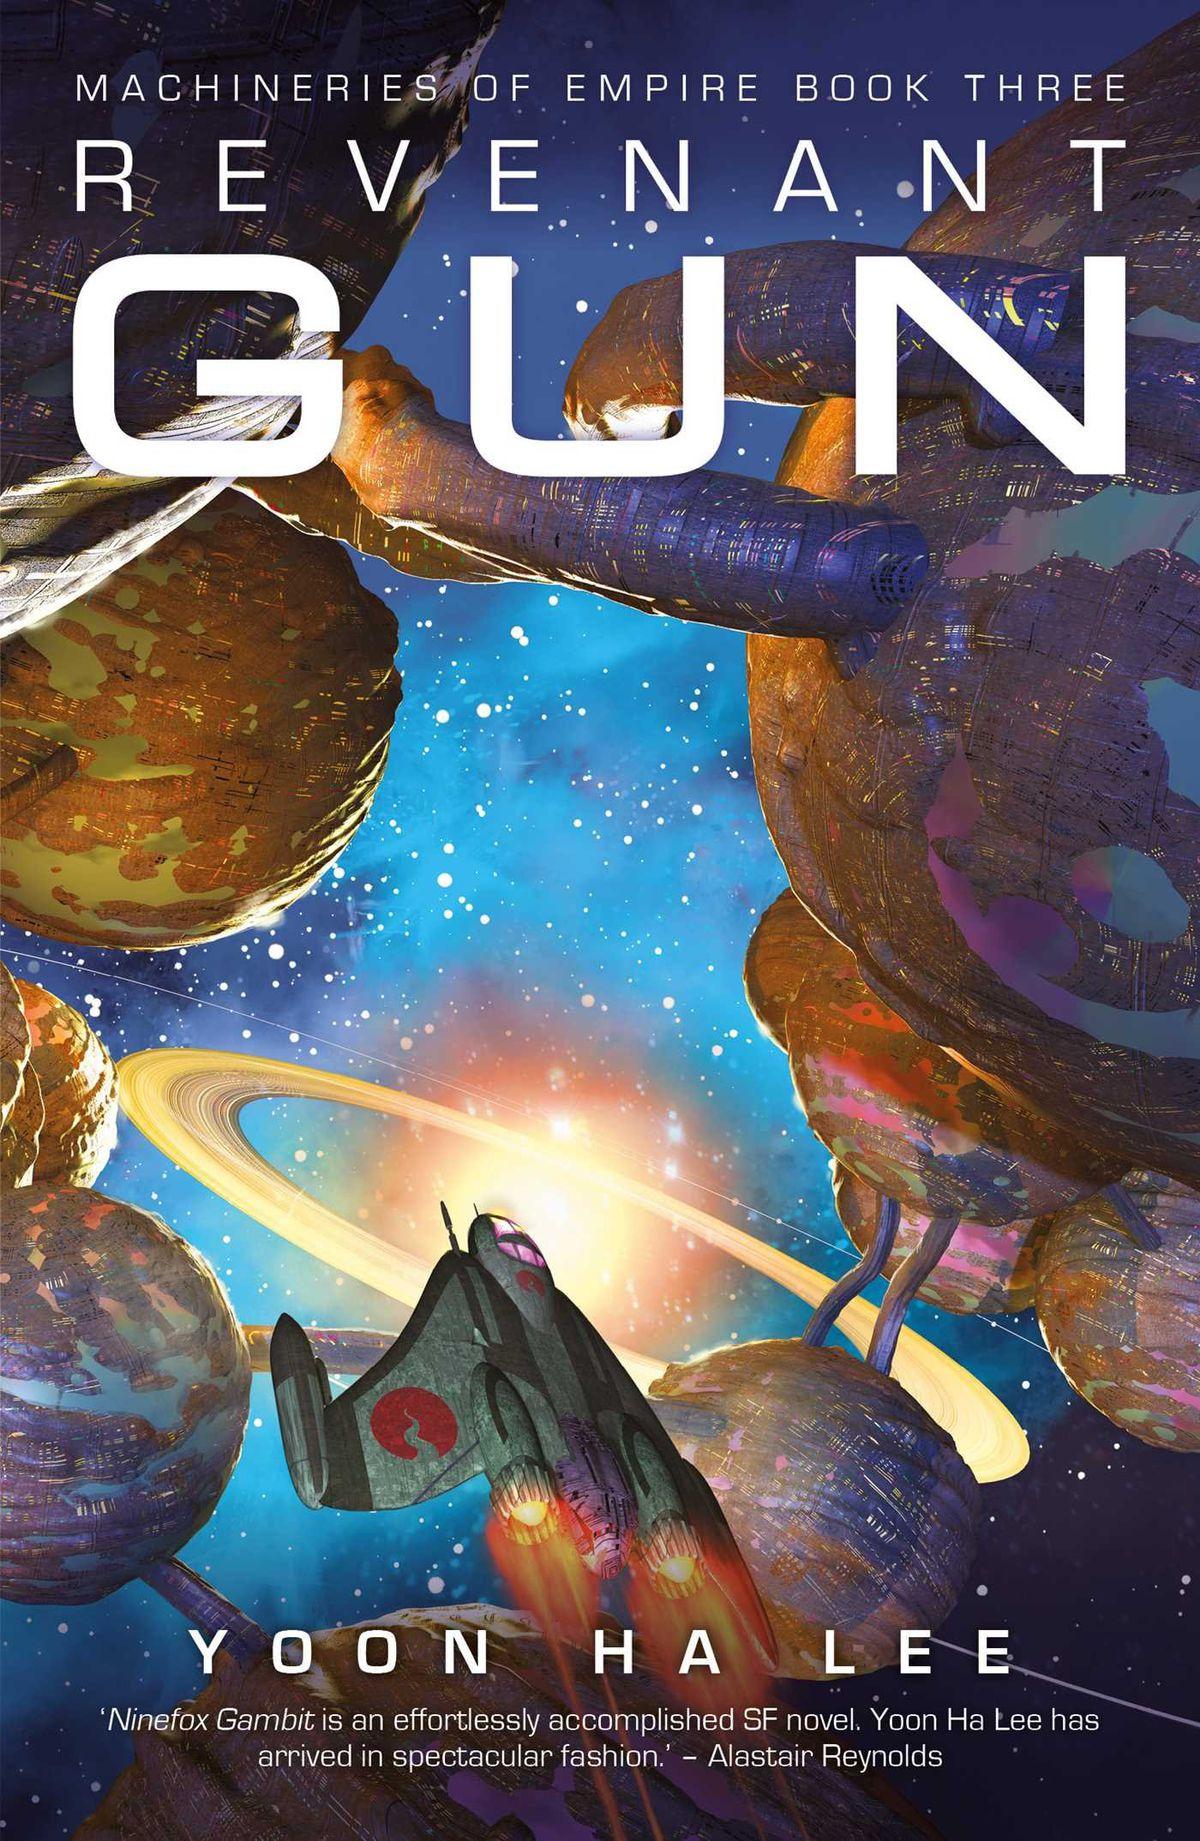 books fiction science fantasy june sci fi gun revenant enthralling check need recommendations verge horror